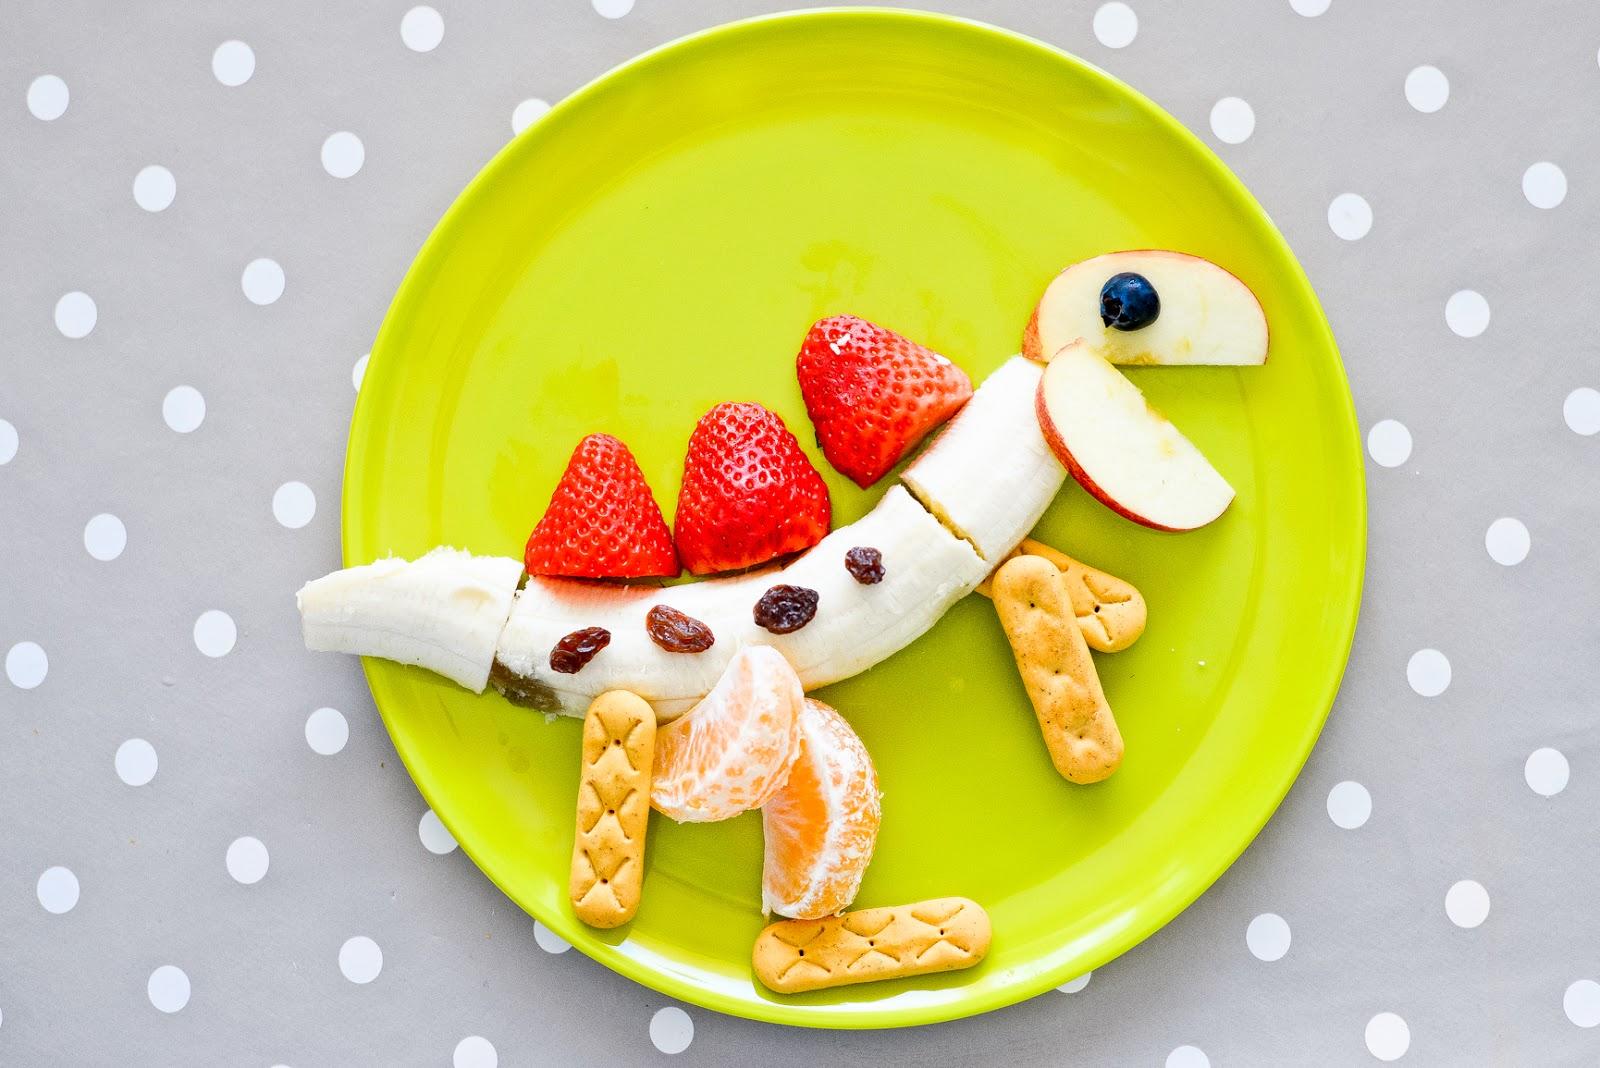 dinosaur snack idea, fun snack ideas for kids, toddler snack ideas, toddler snacks, healthy snacks for kids,